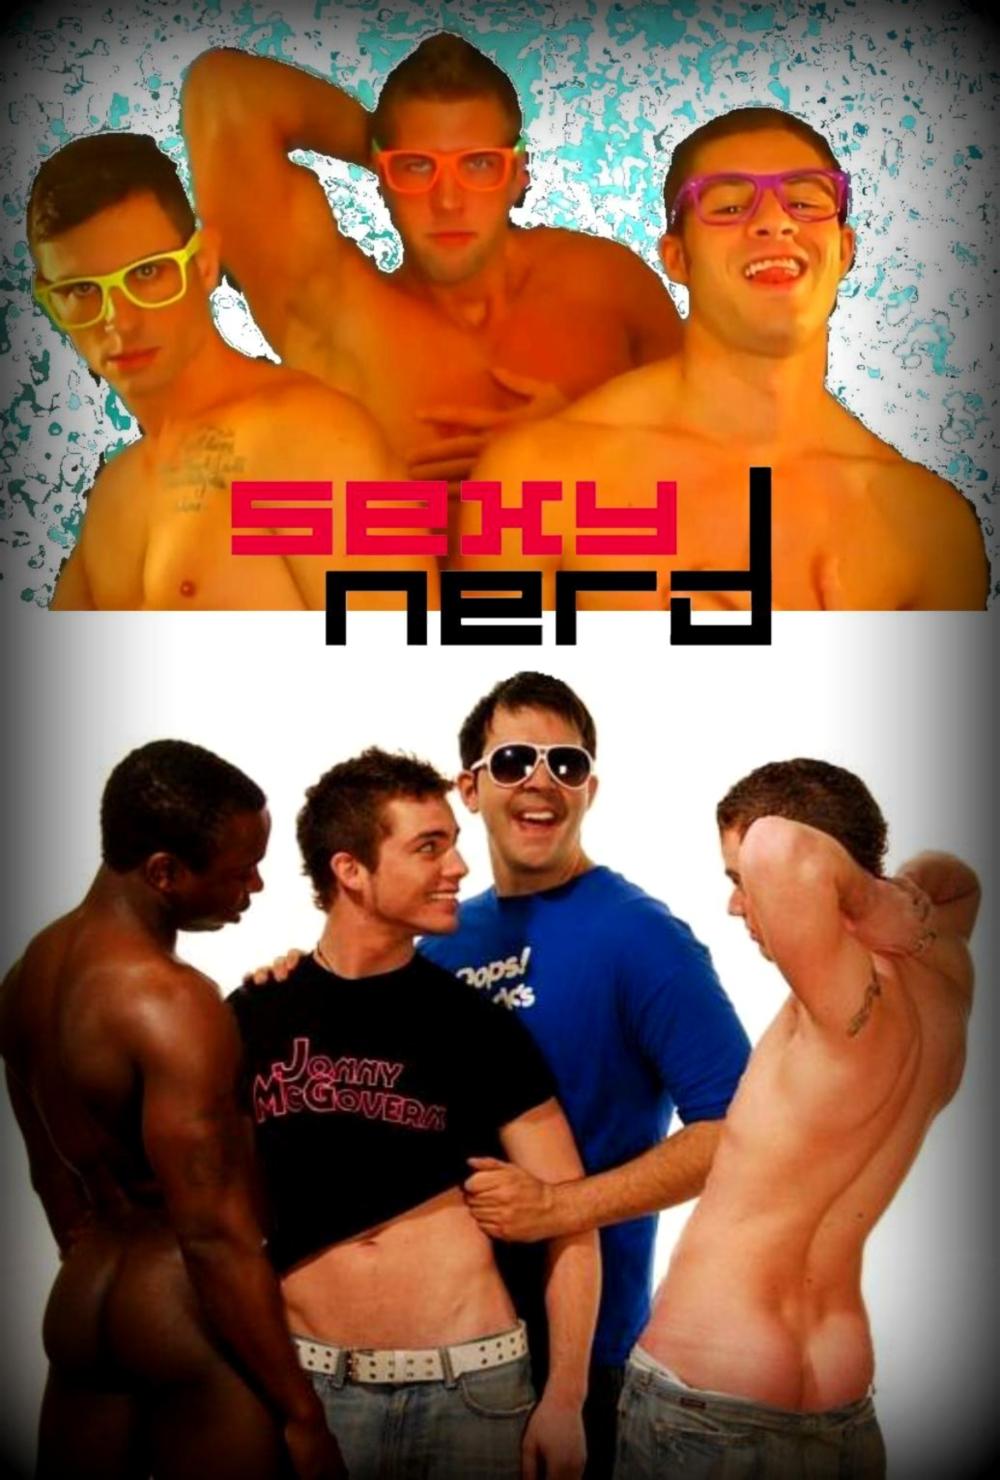 Sexy Nerd (2011) Jonny McGovern